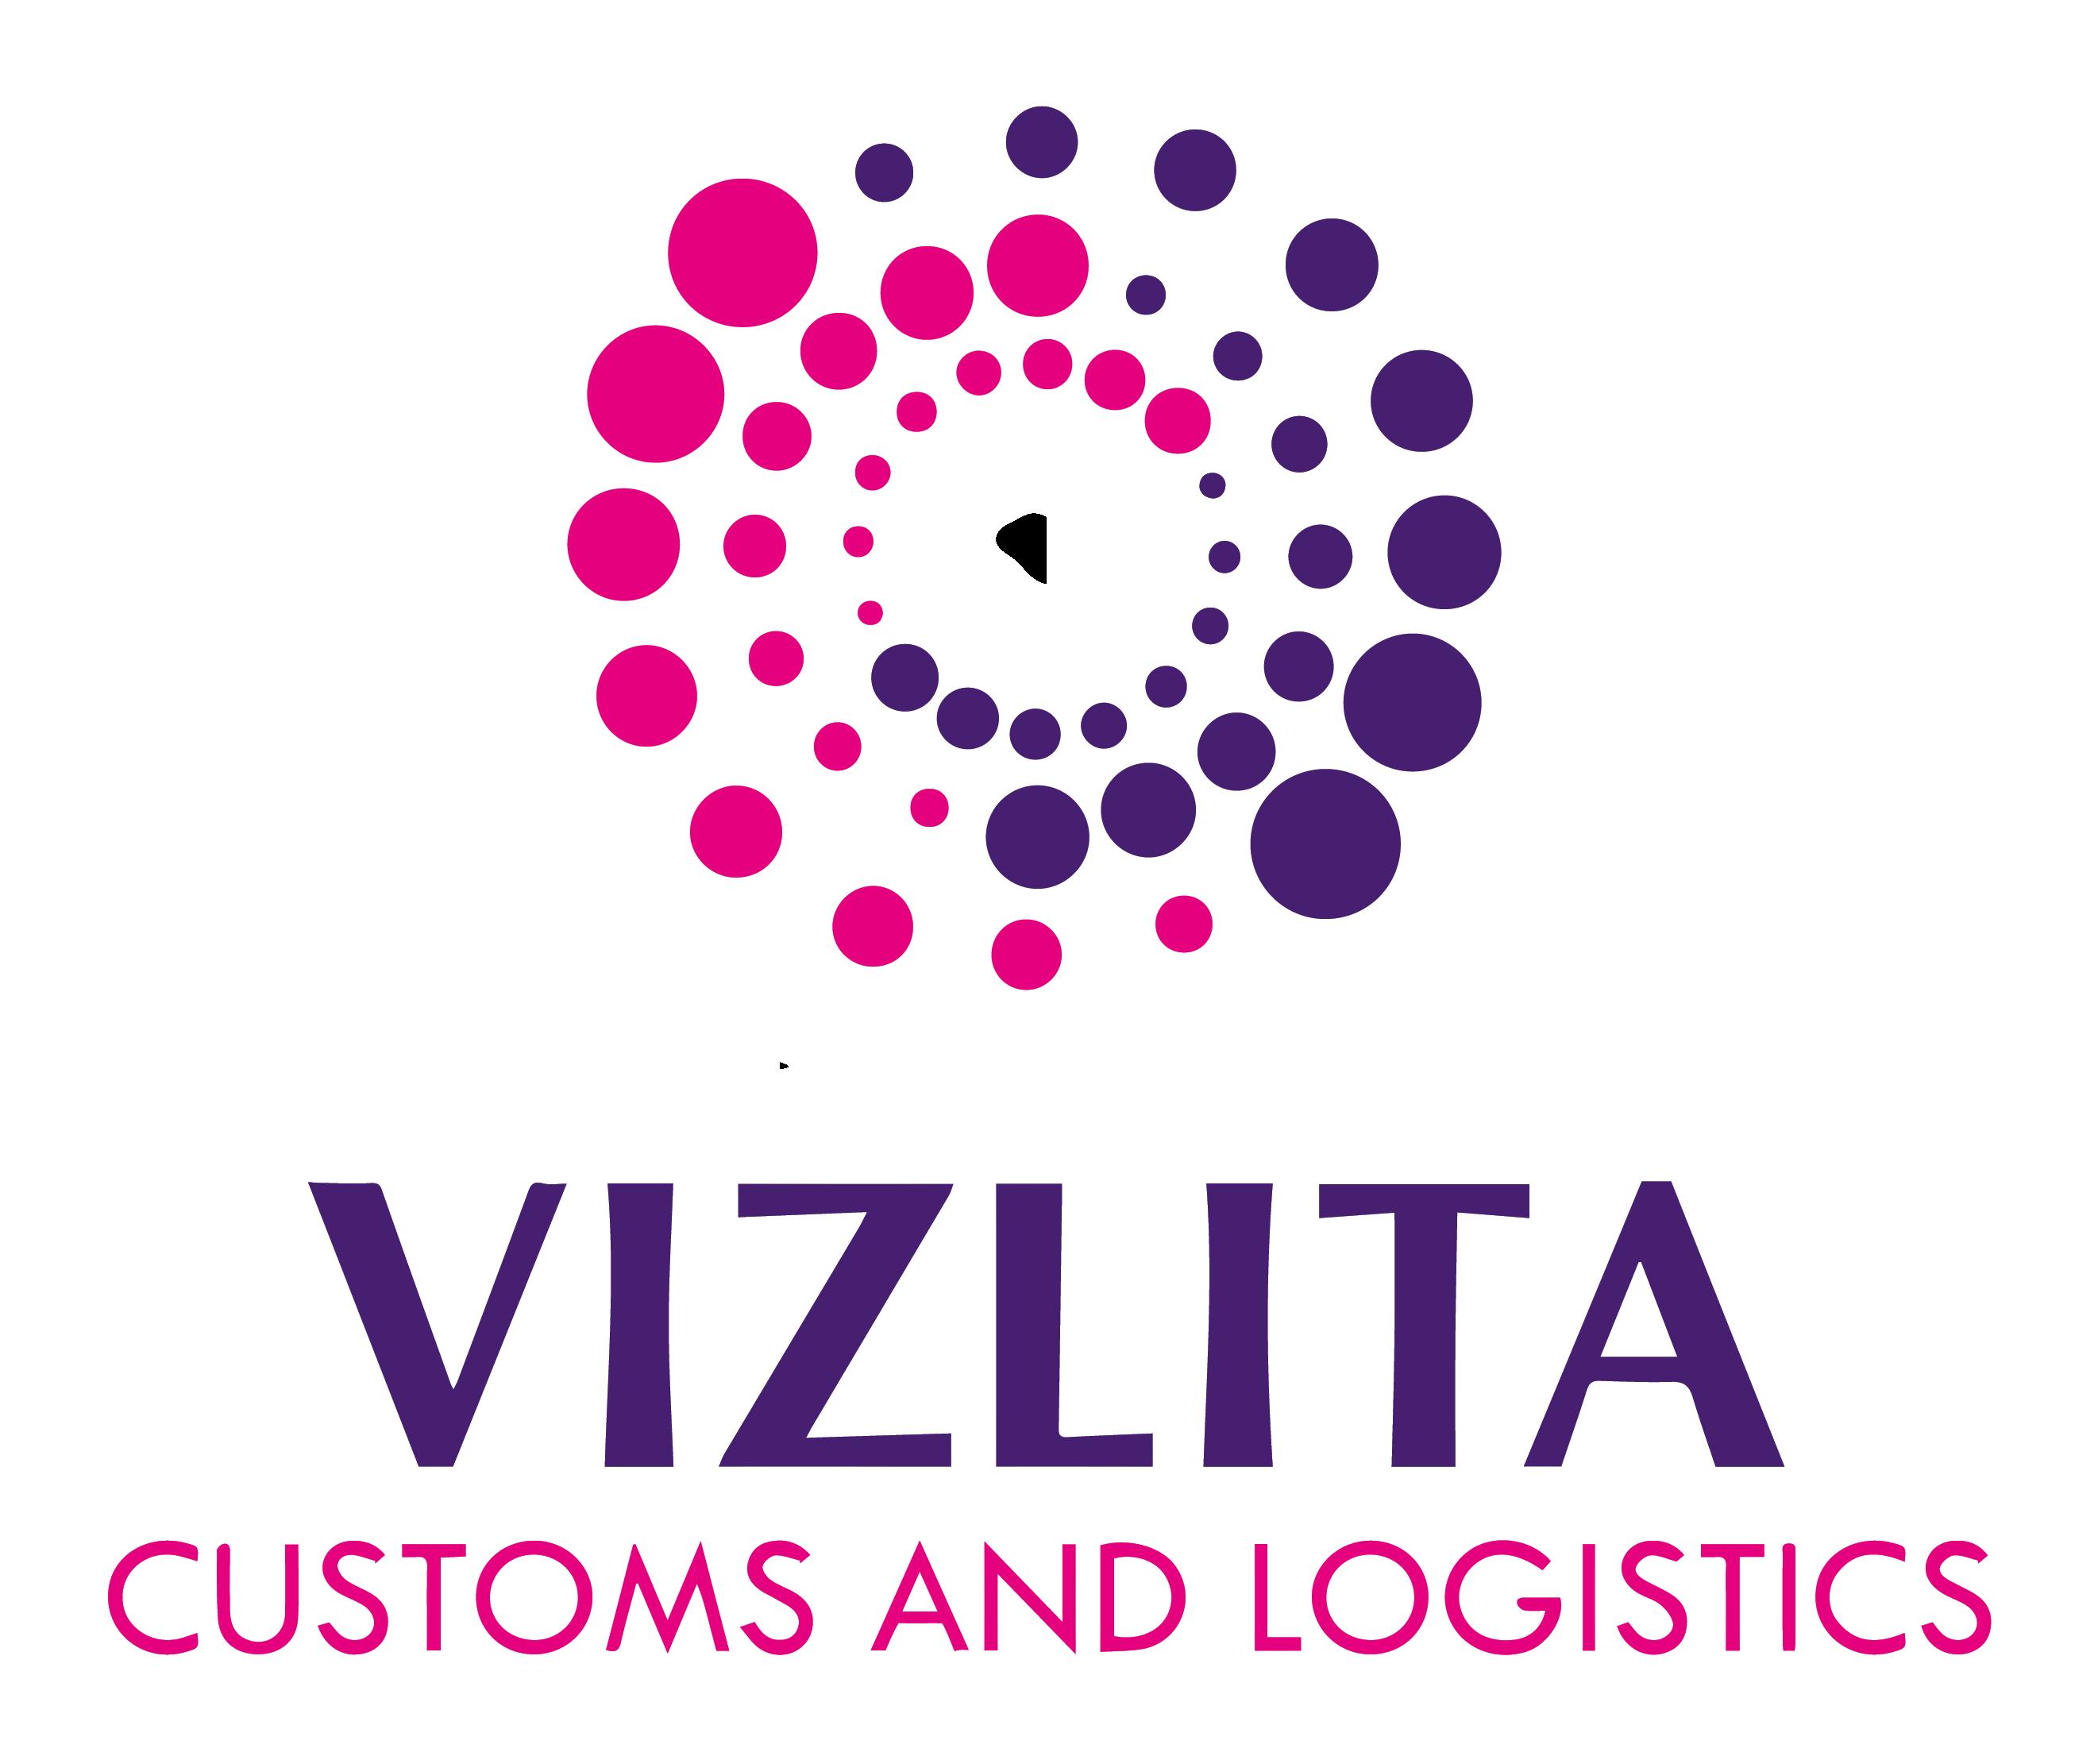 www.vizlita.eu